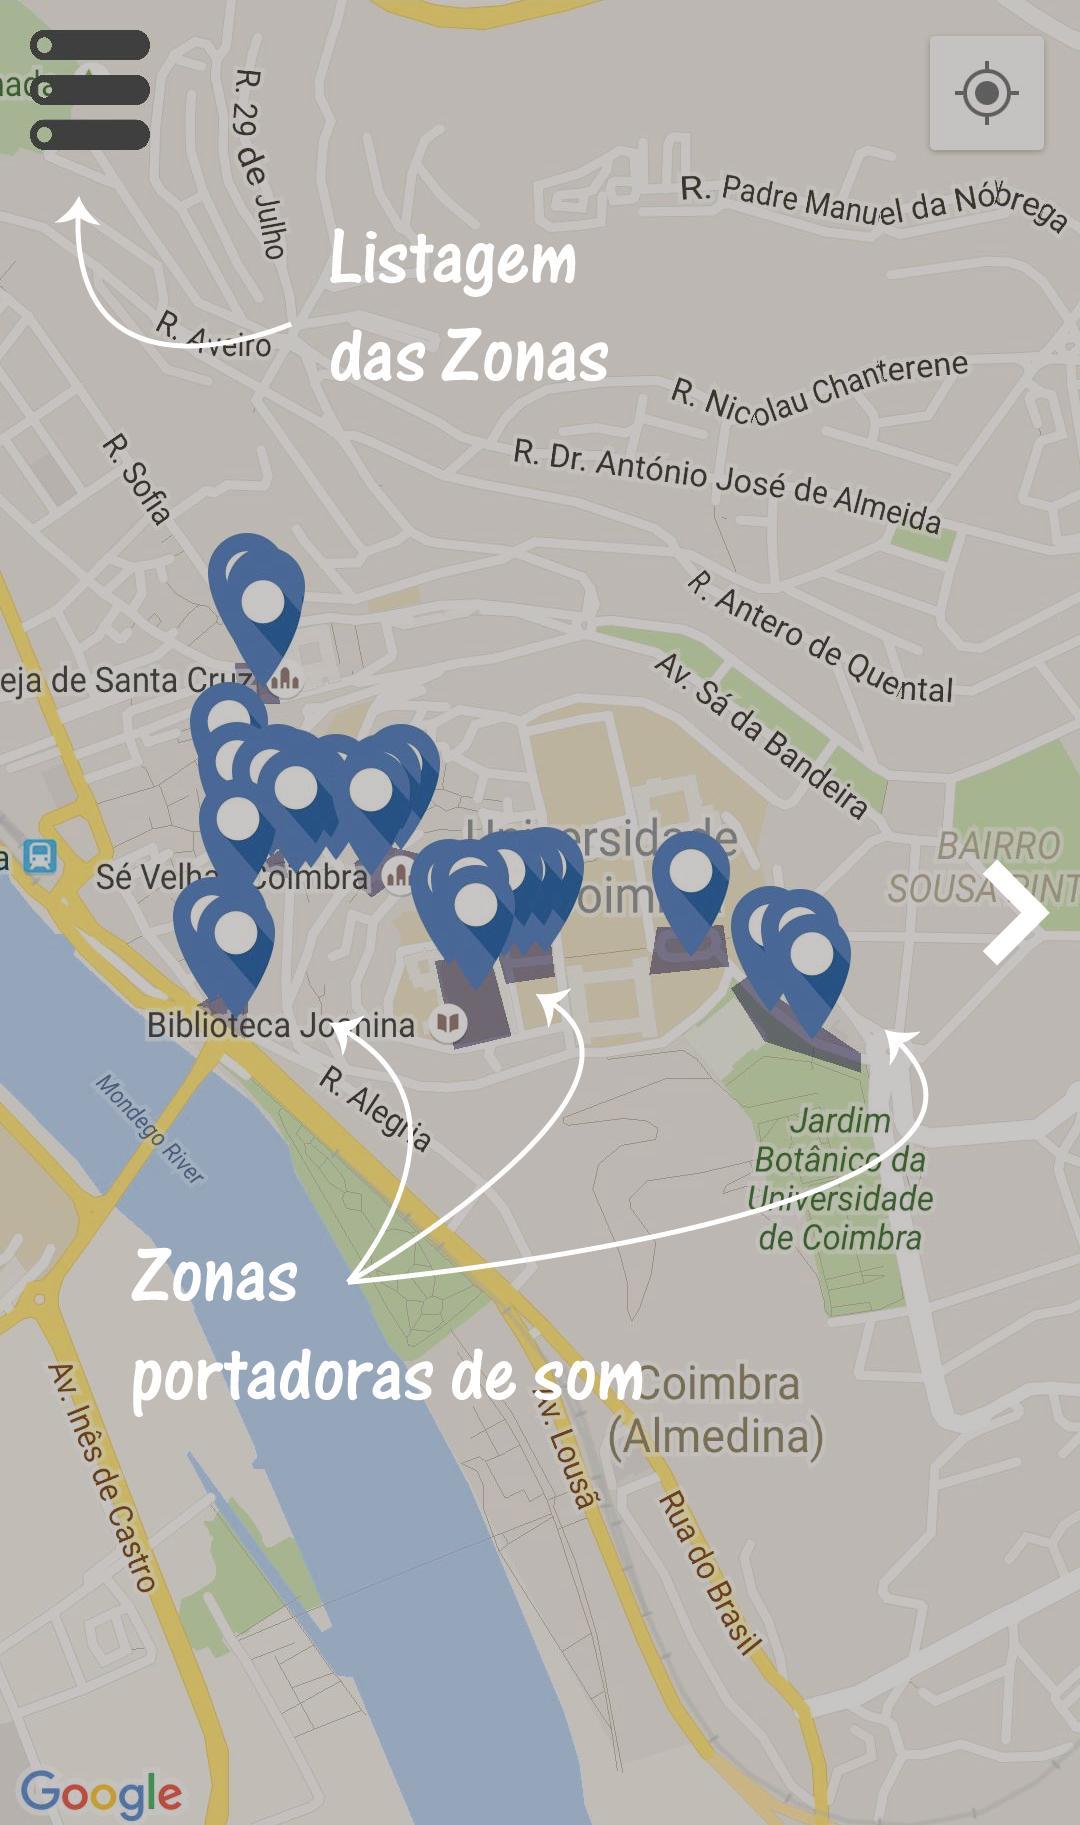 Coimbra SoundWalk (Unreleased) poster